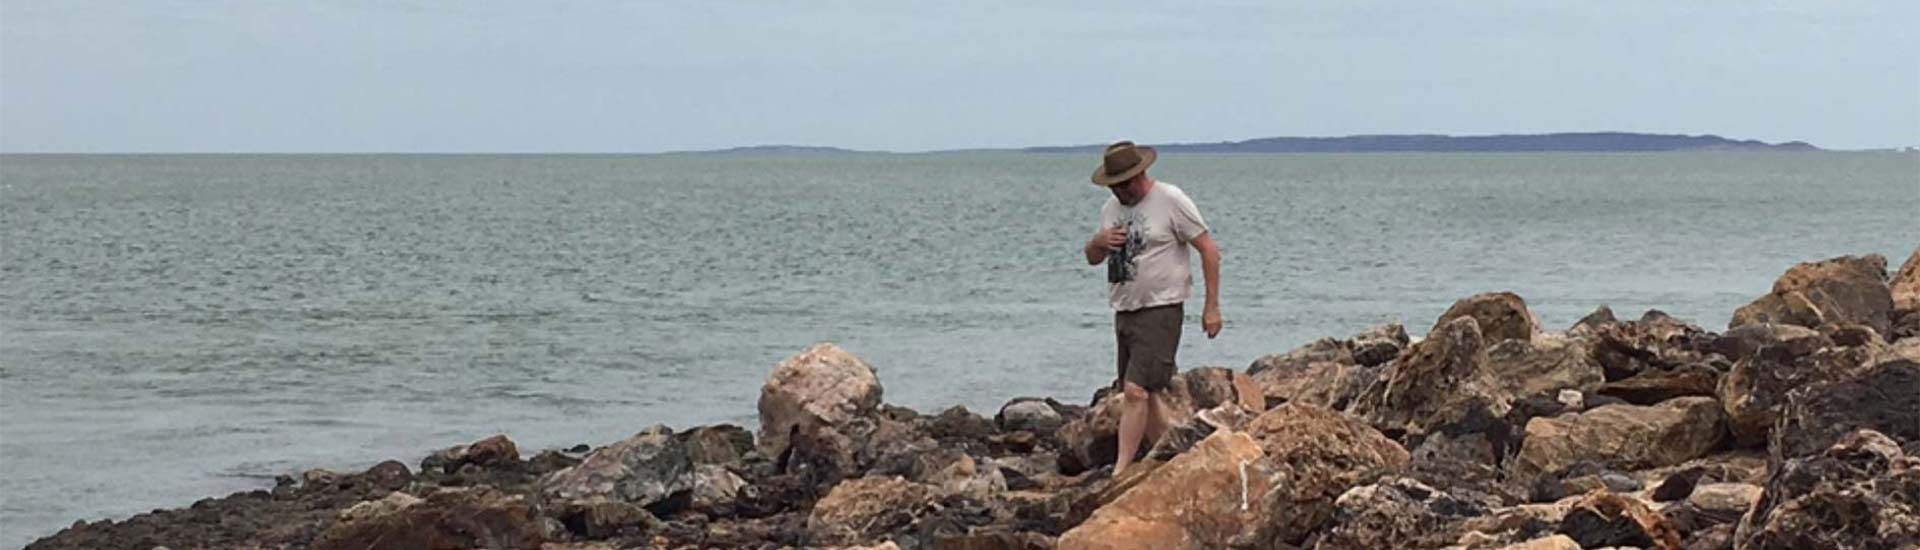 fishing-at-cleaverville-wa